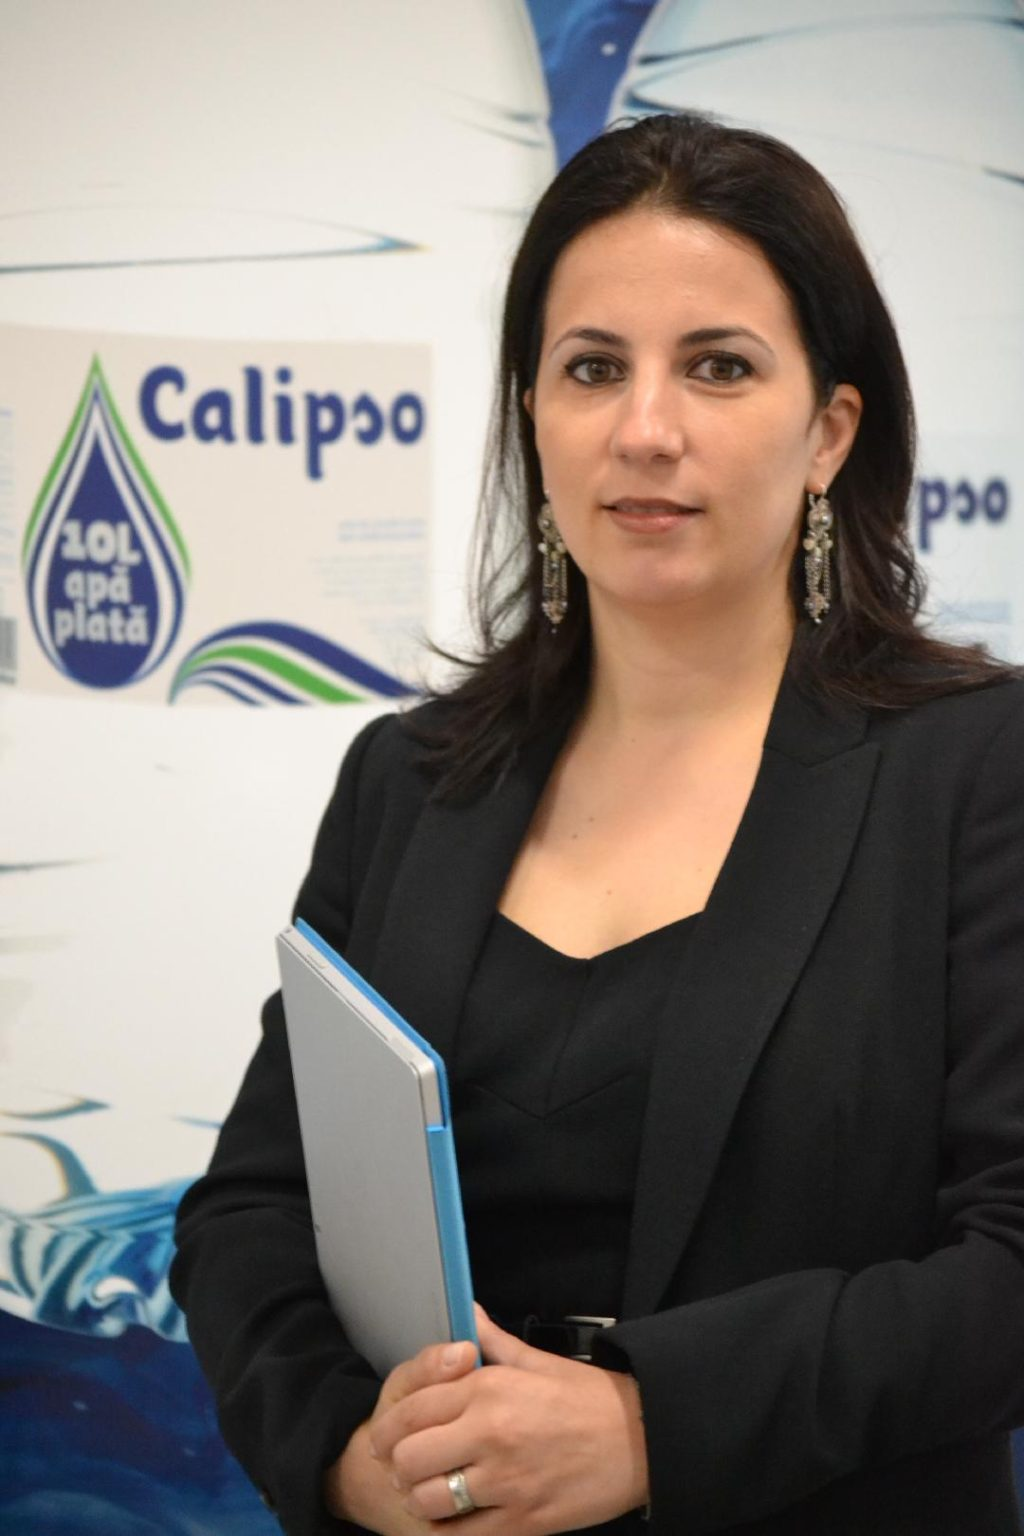 Daciana Siderache, director general Apa Calipso